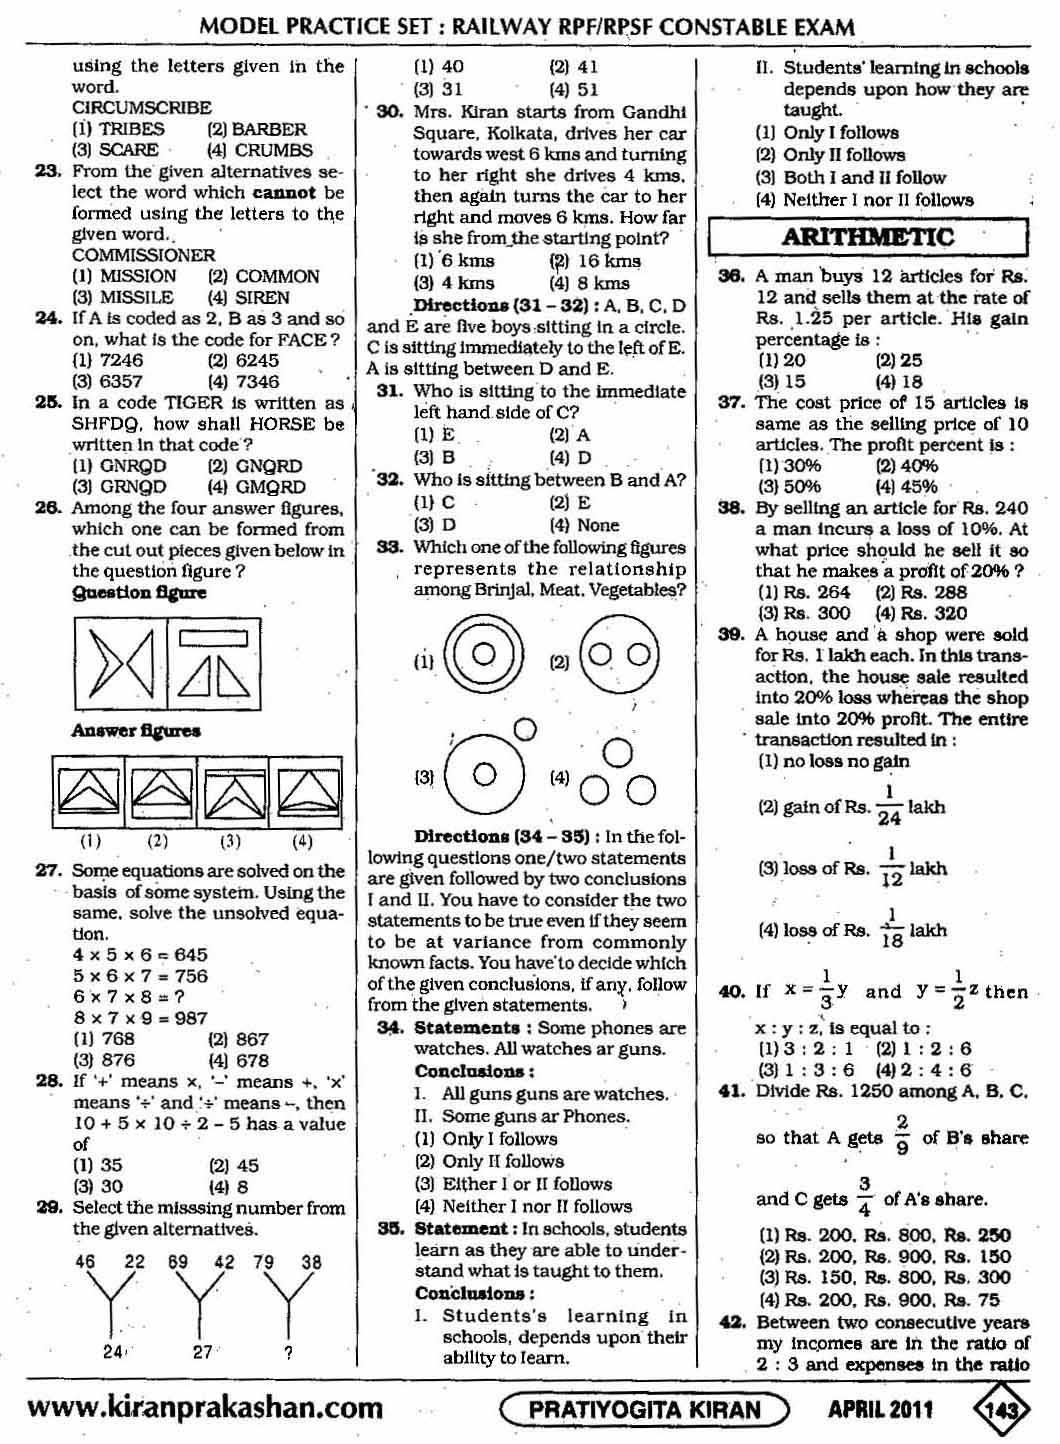 technical helper question paper download